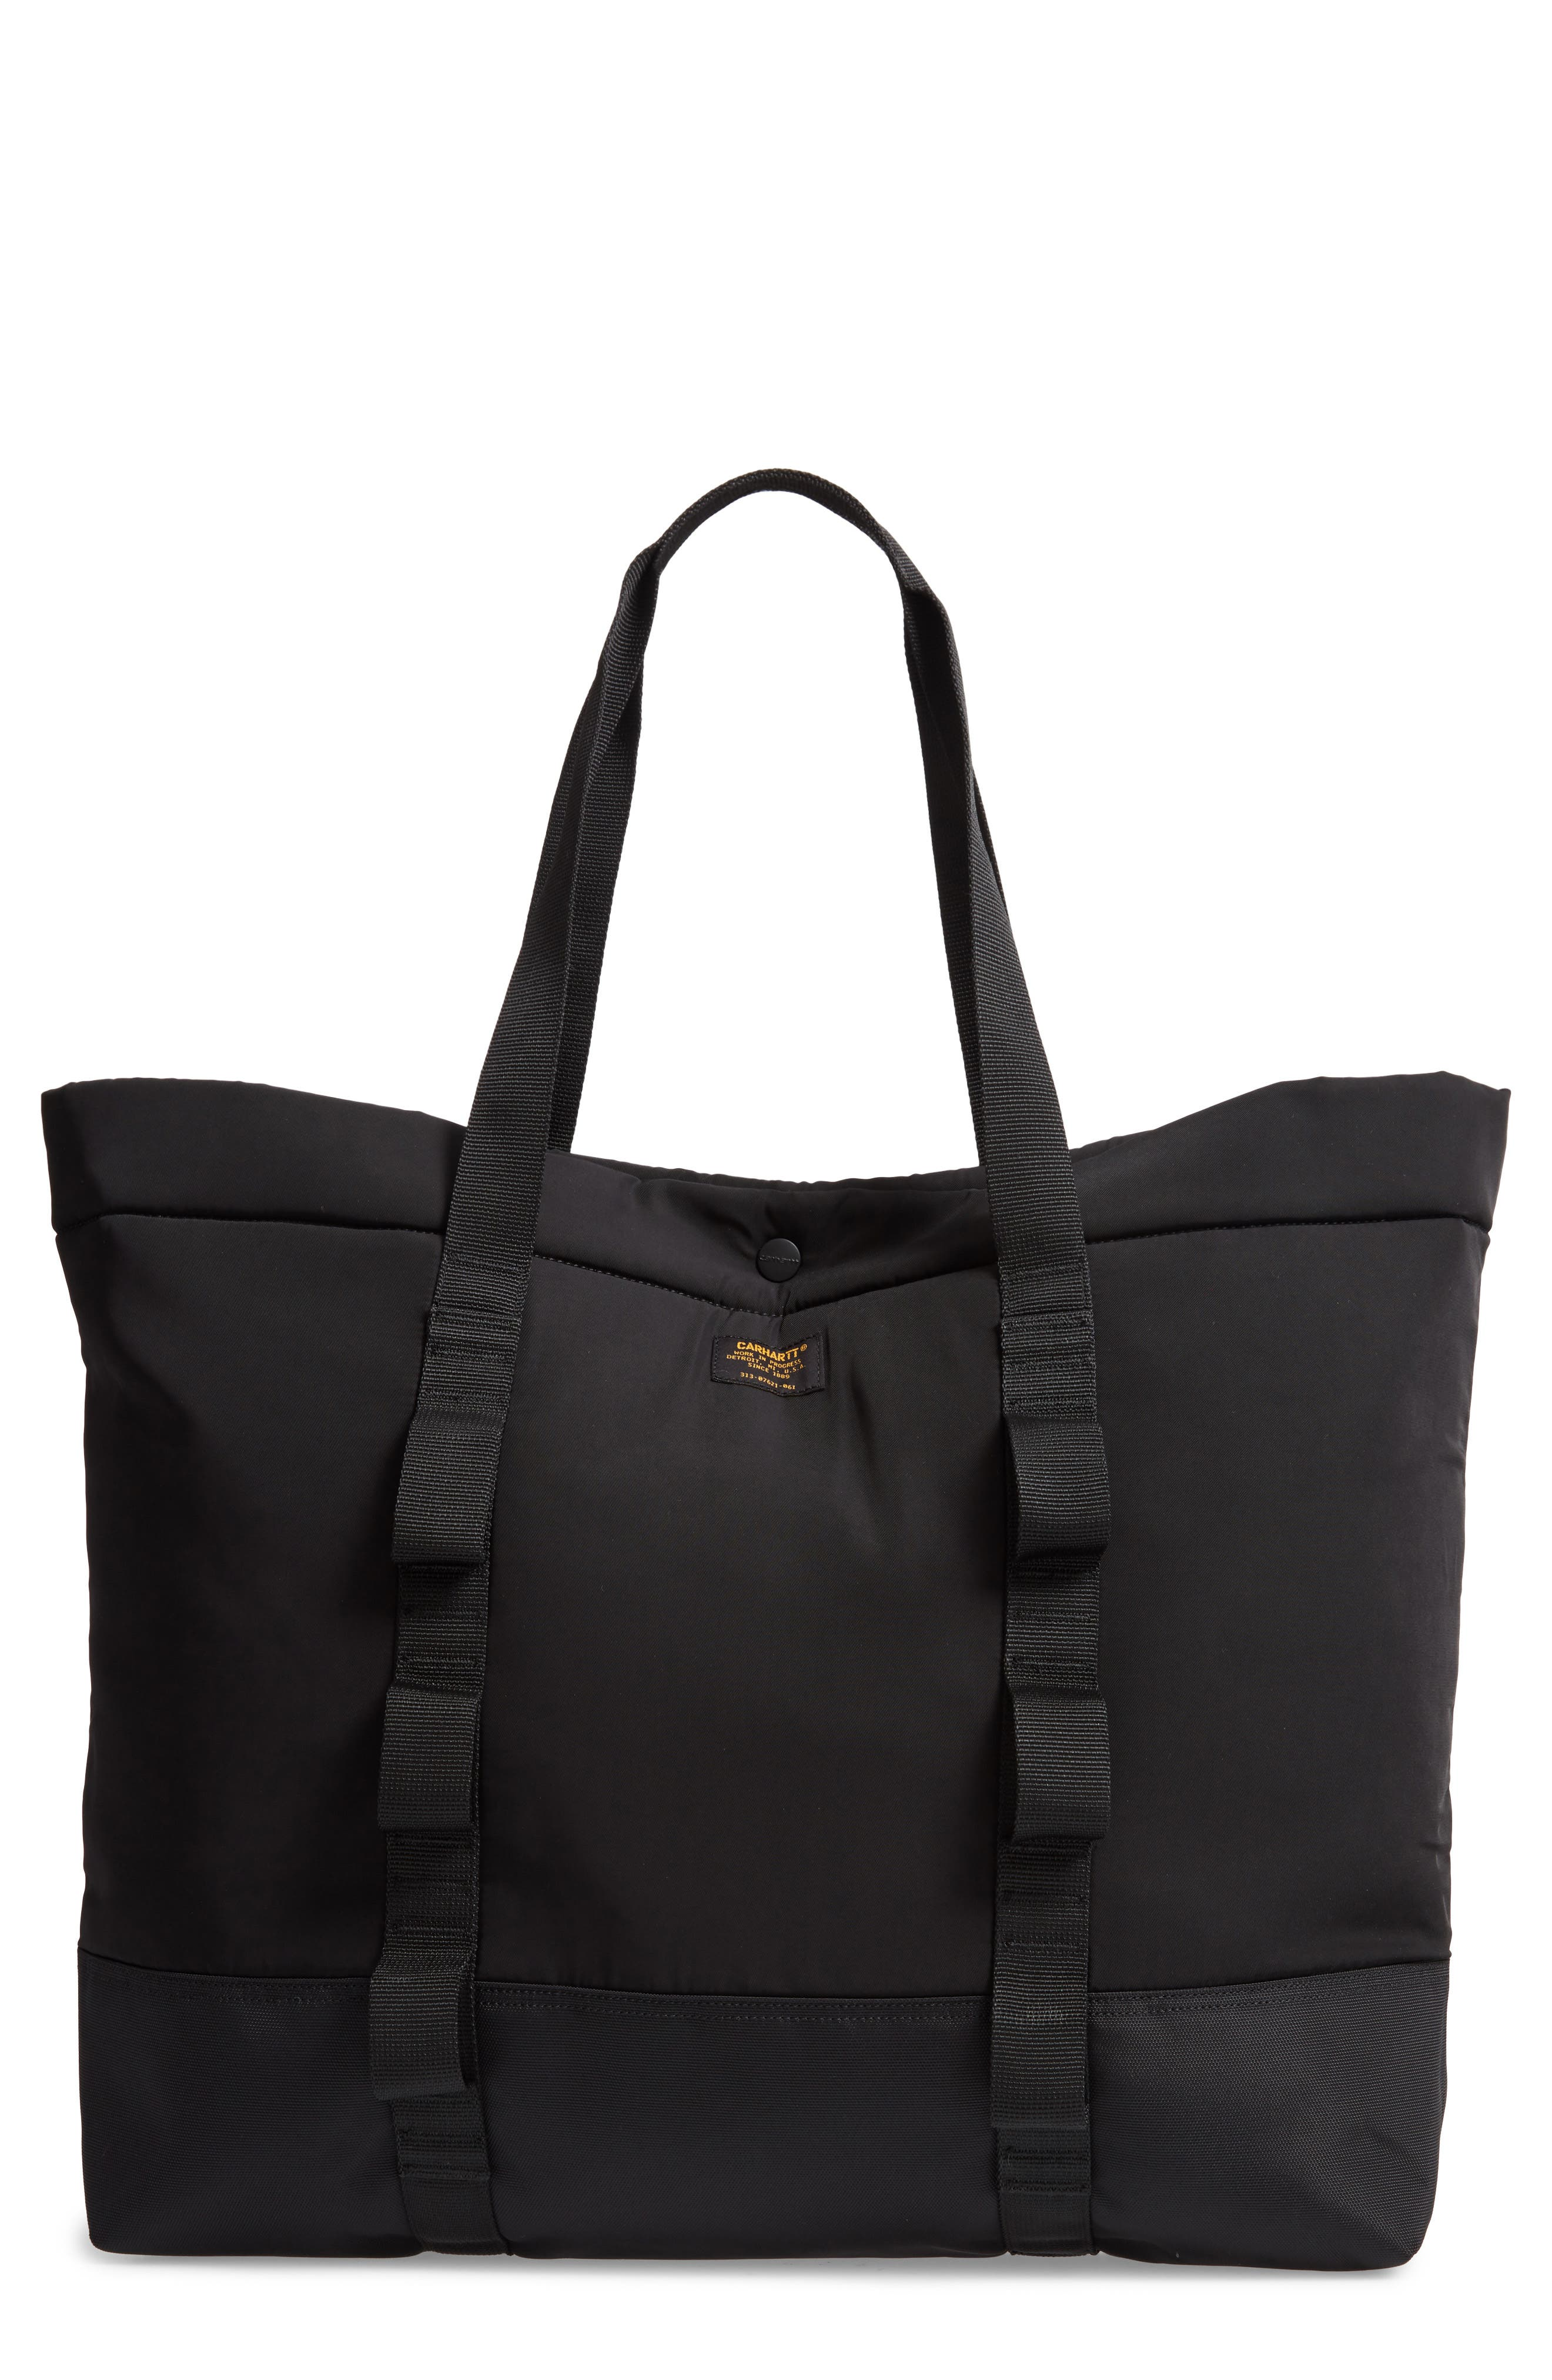 Military Shopper Tote Bag,                         Main,                         color, BLACK / BLACK